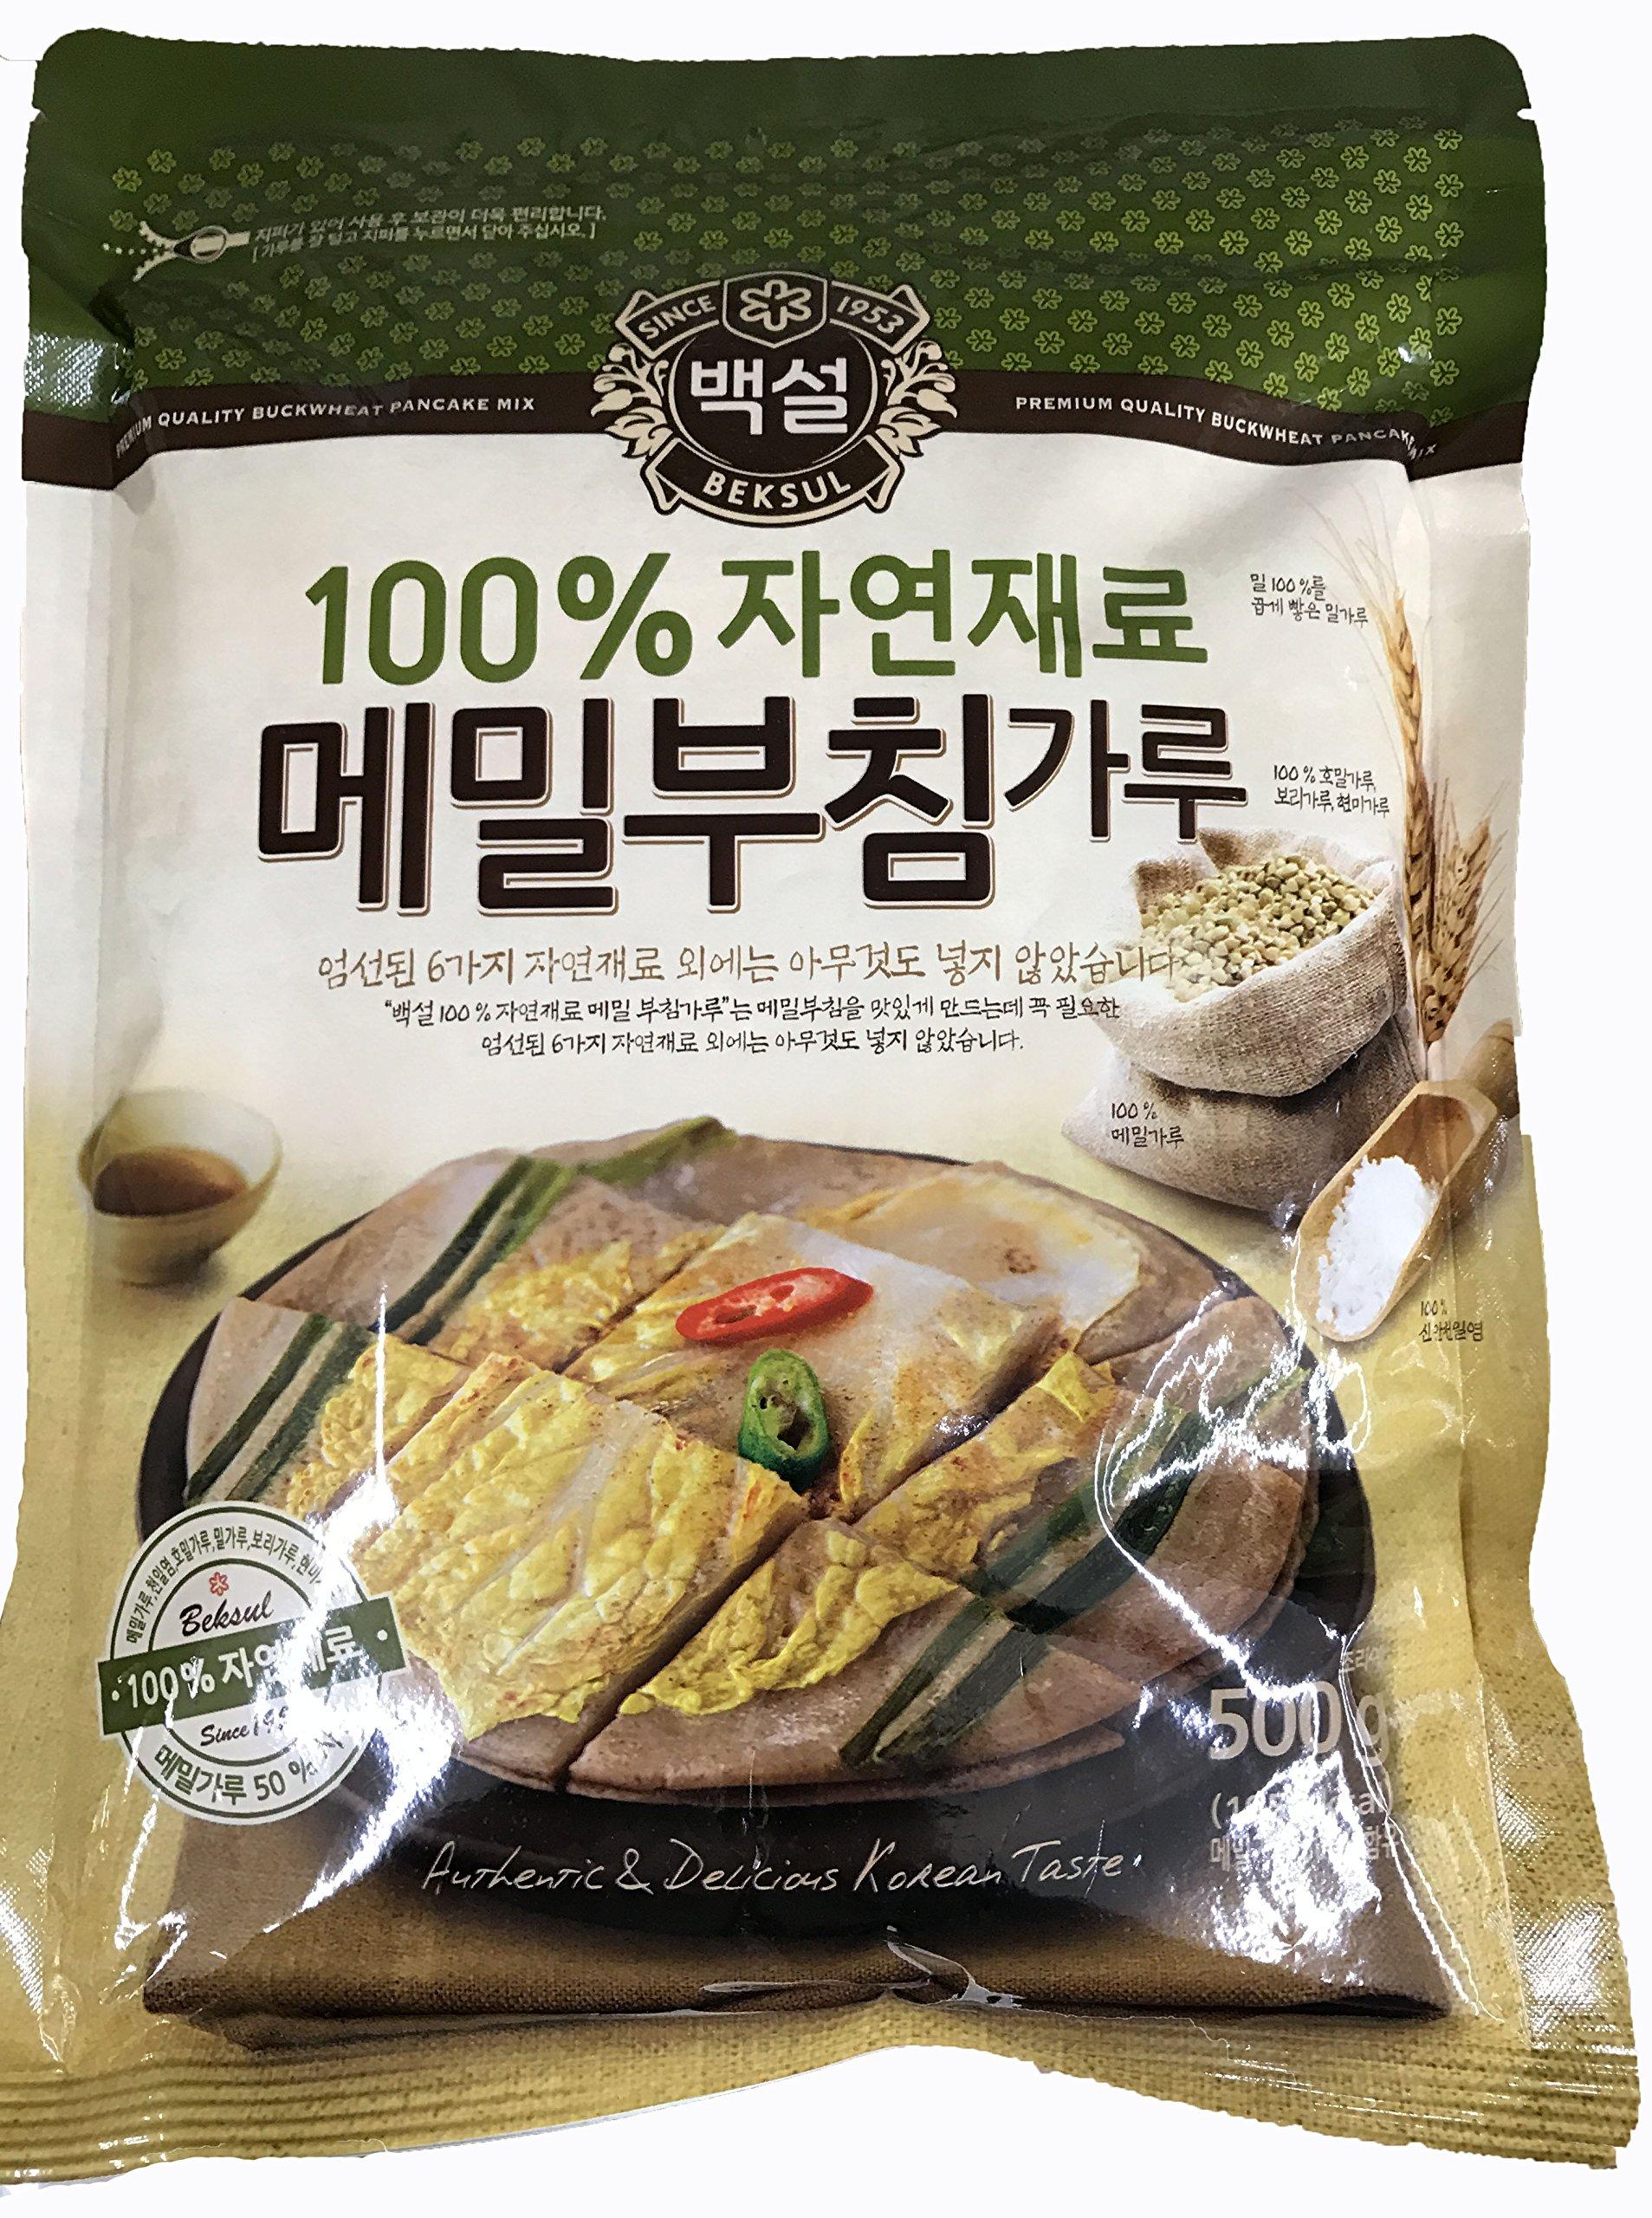 Beksul Natural Buckwheat(Memil) Pancakes Mix; 500g(1.1 pounds) by Planetkorean